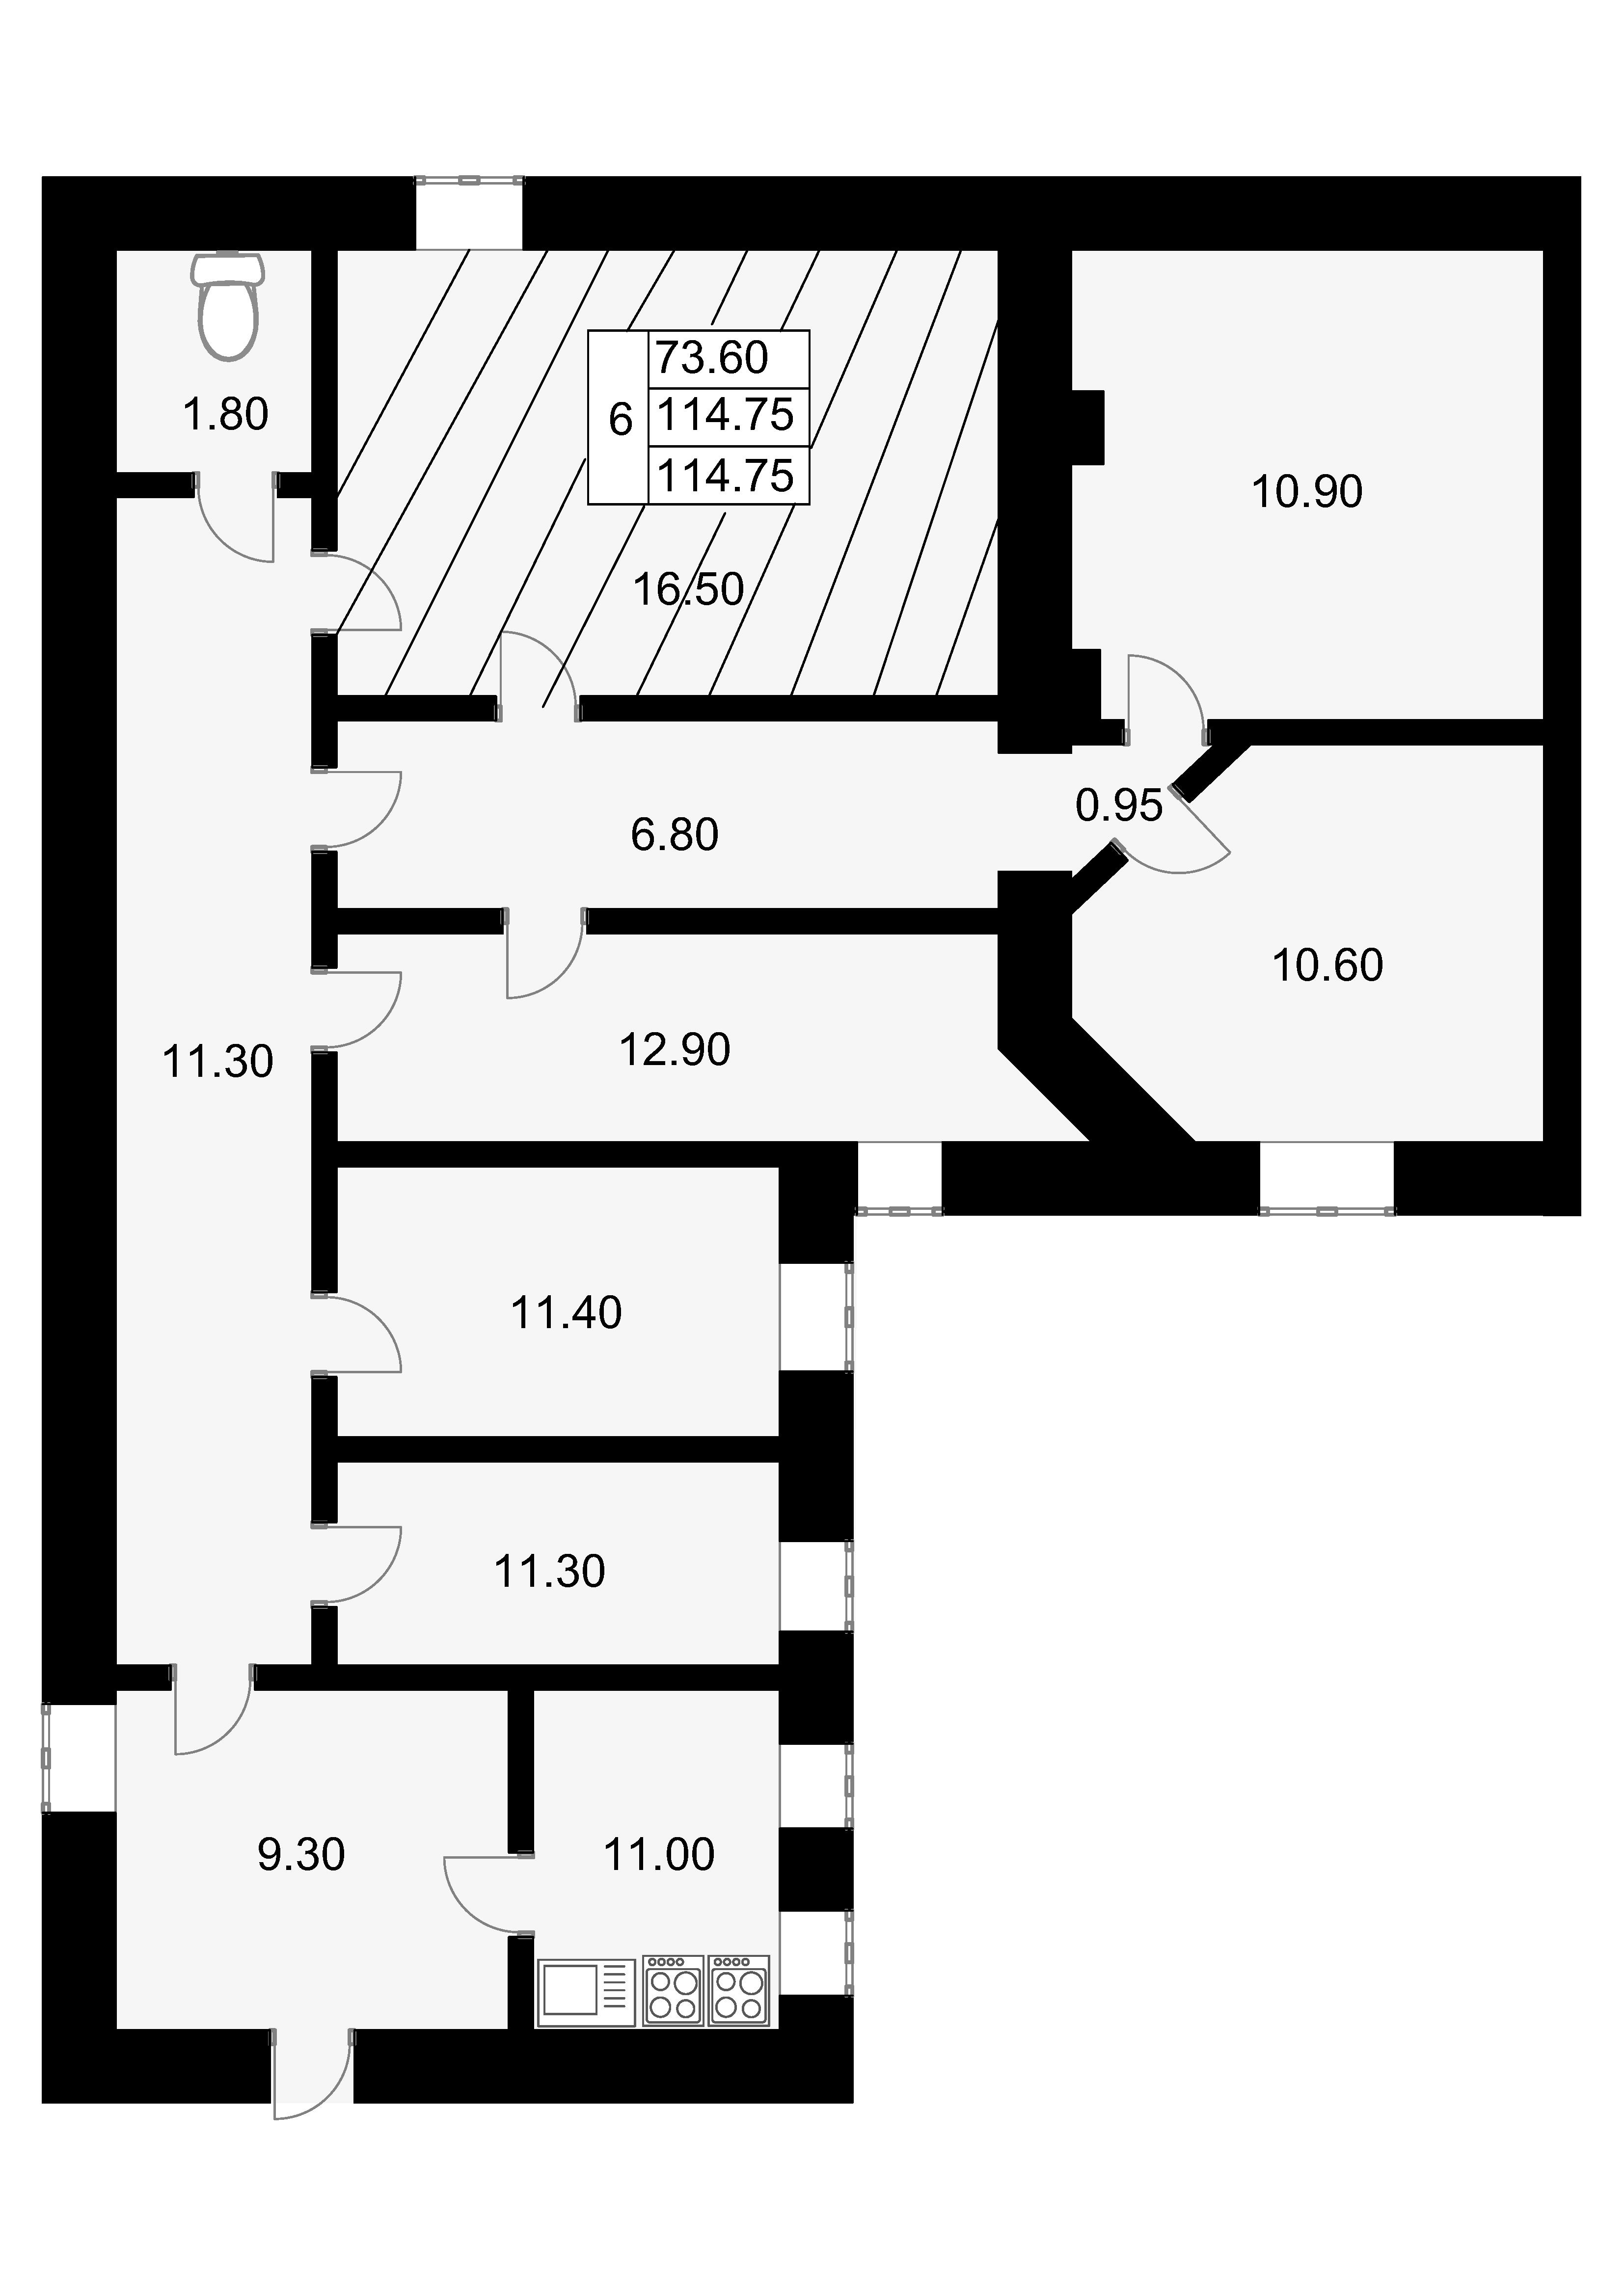 Комната, 114.75 м², 4 этаж – Планировка